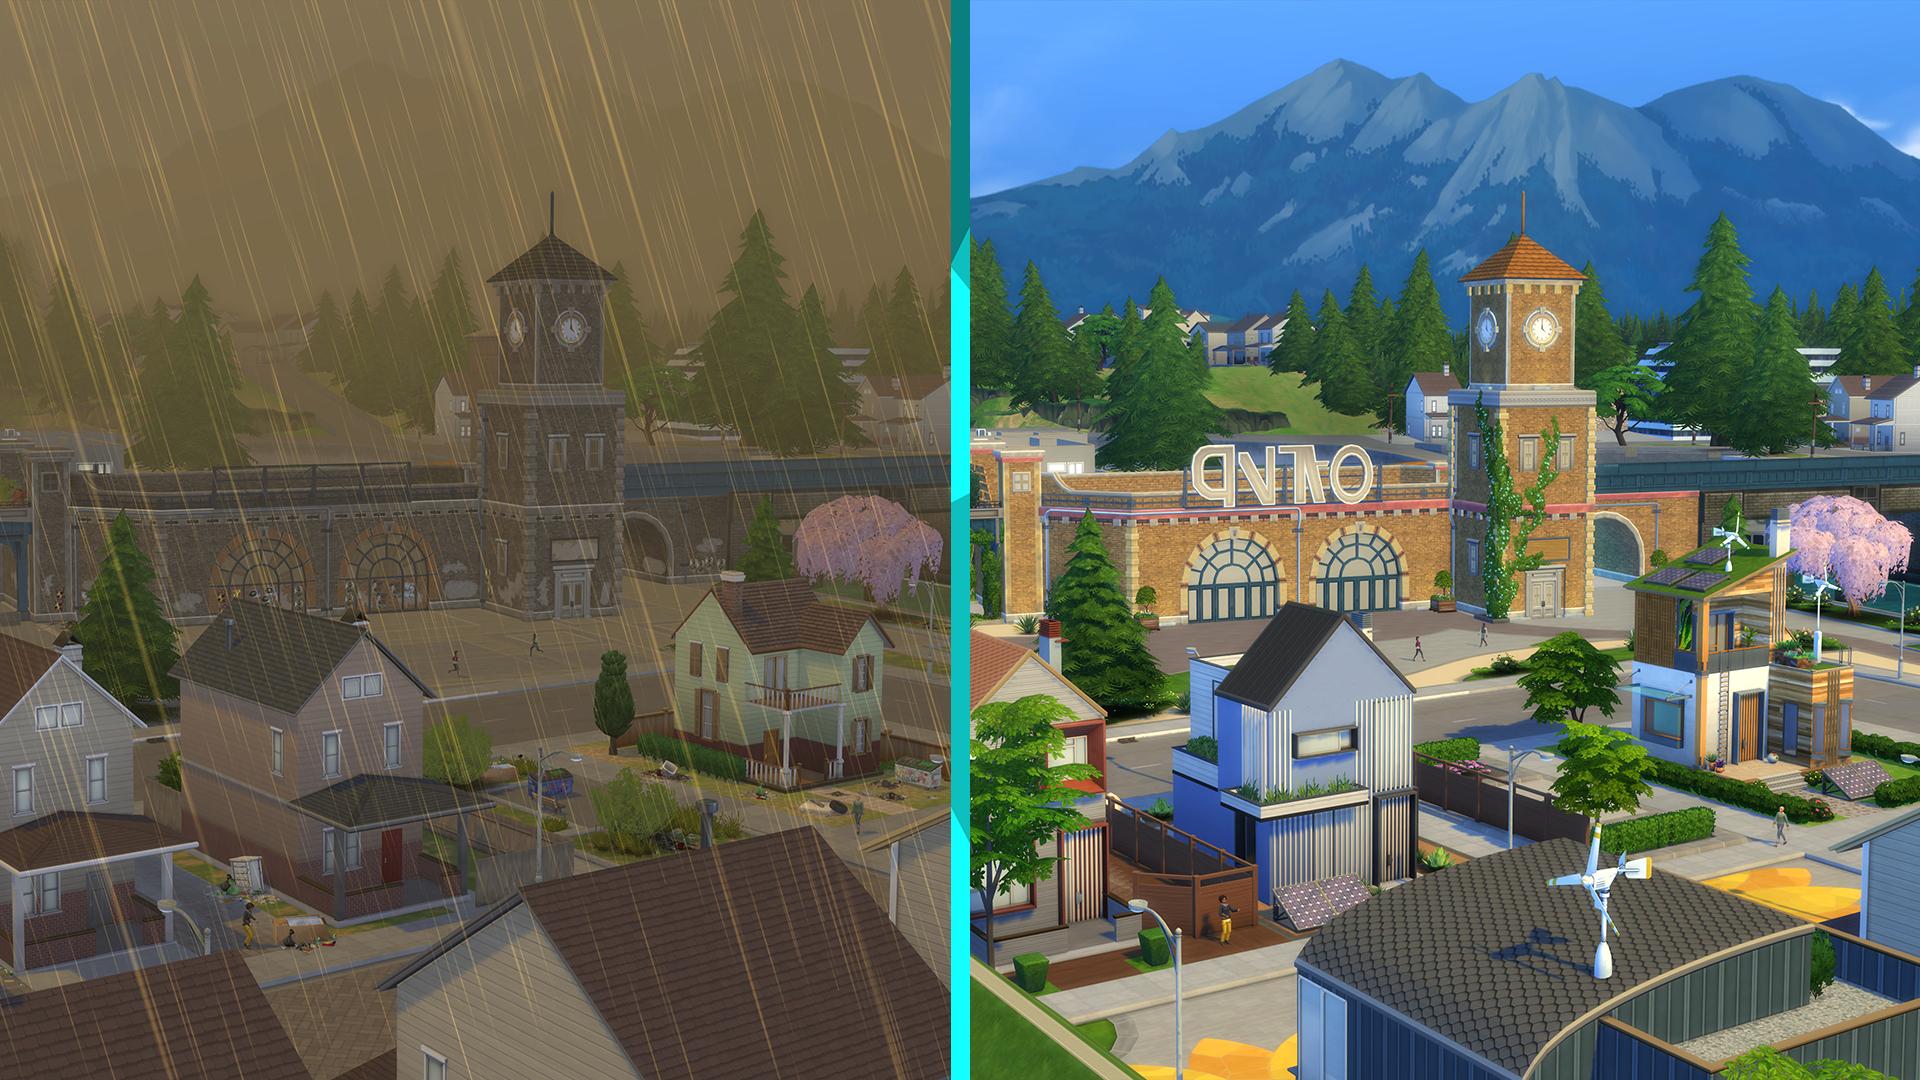 The Sims 4 Eco Lifestyle (PC) - Origin Key - GLOBAL - 4